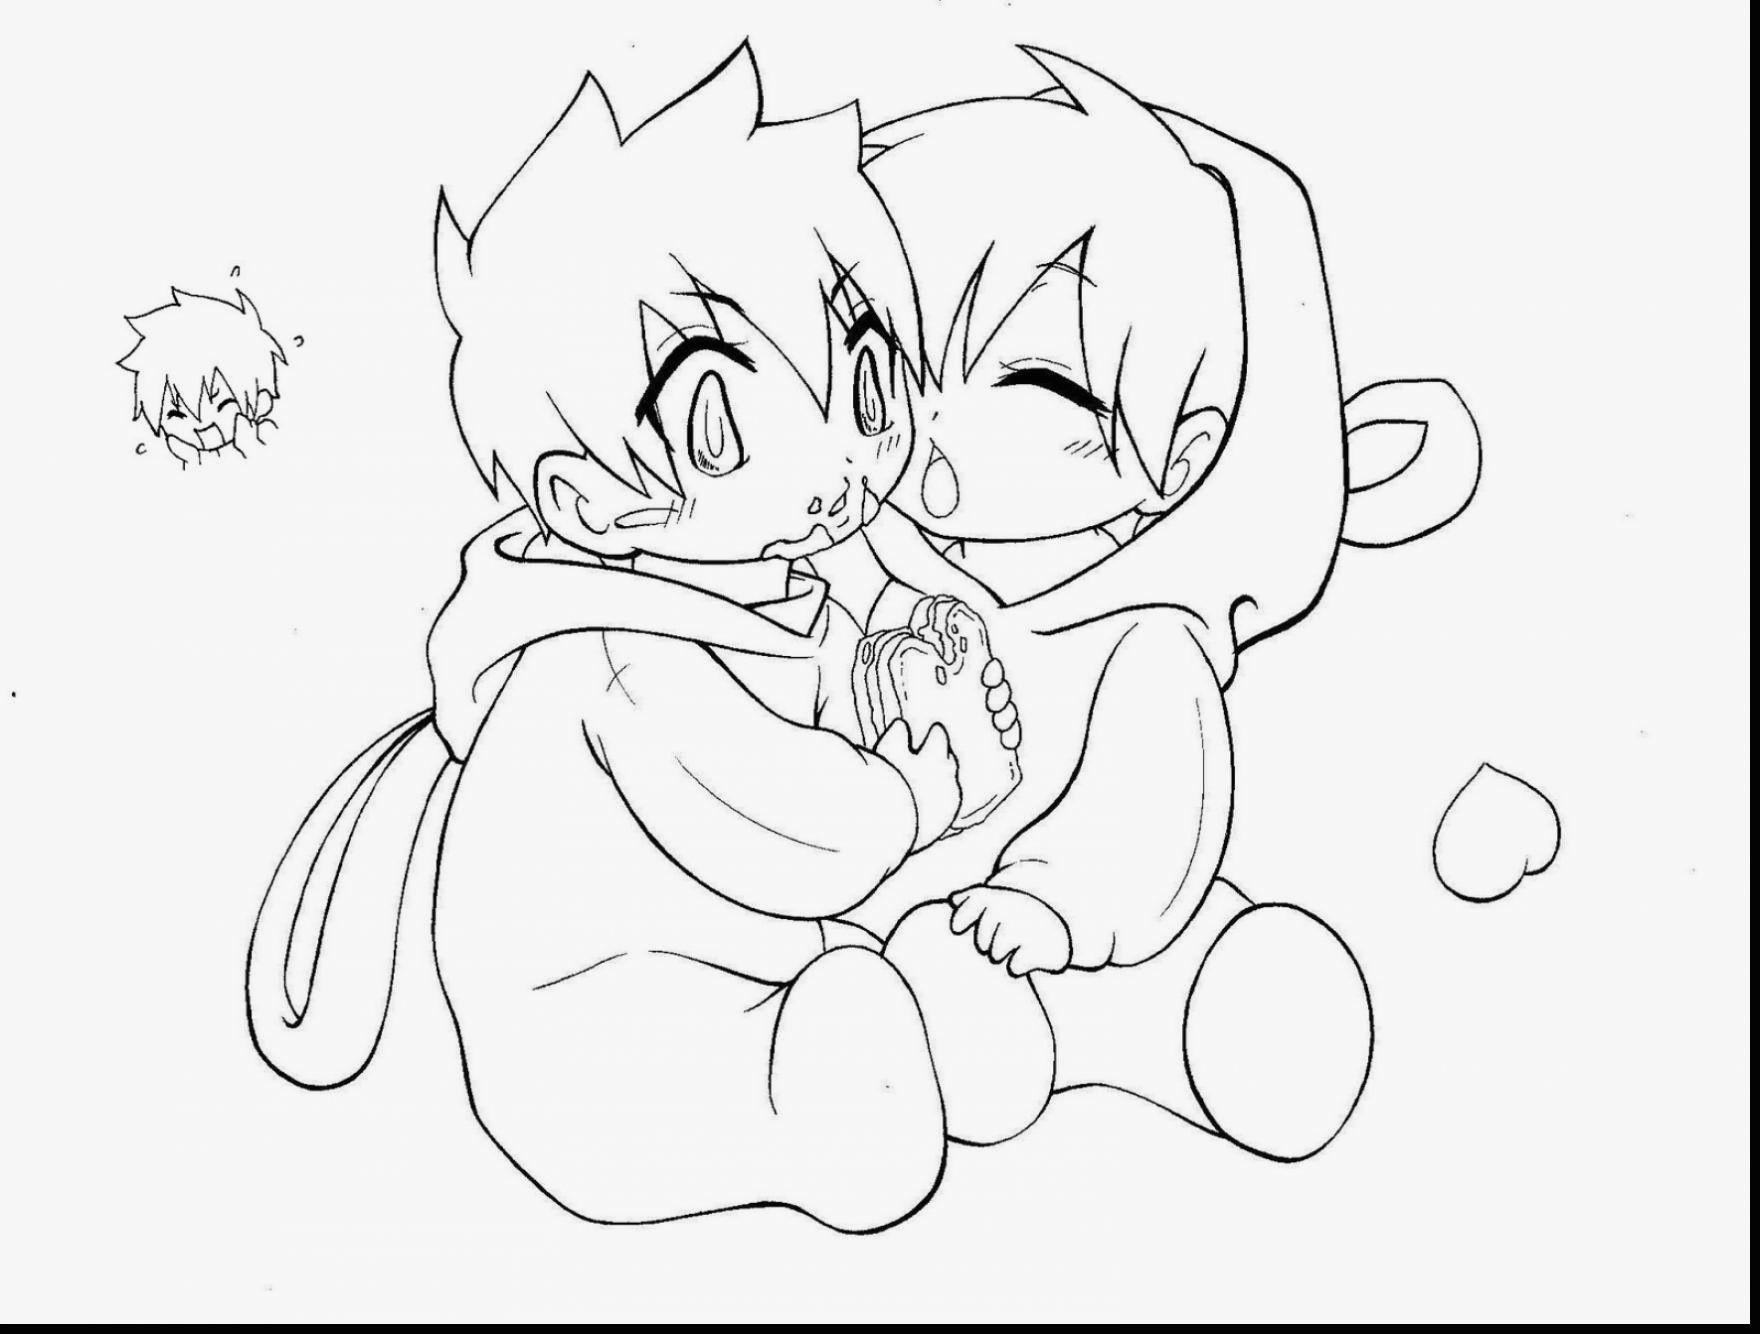 Boku No Hero Academia Coloring Pages Todoroki Lineart By Justaweirdgirl Free Printable Coloring Pages Anime Lineart Drawing Sketches Sketches